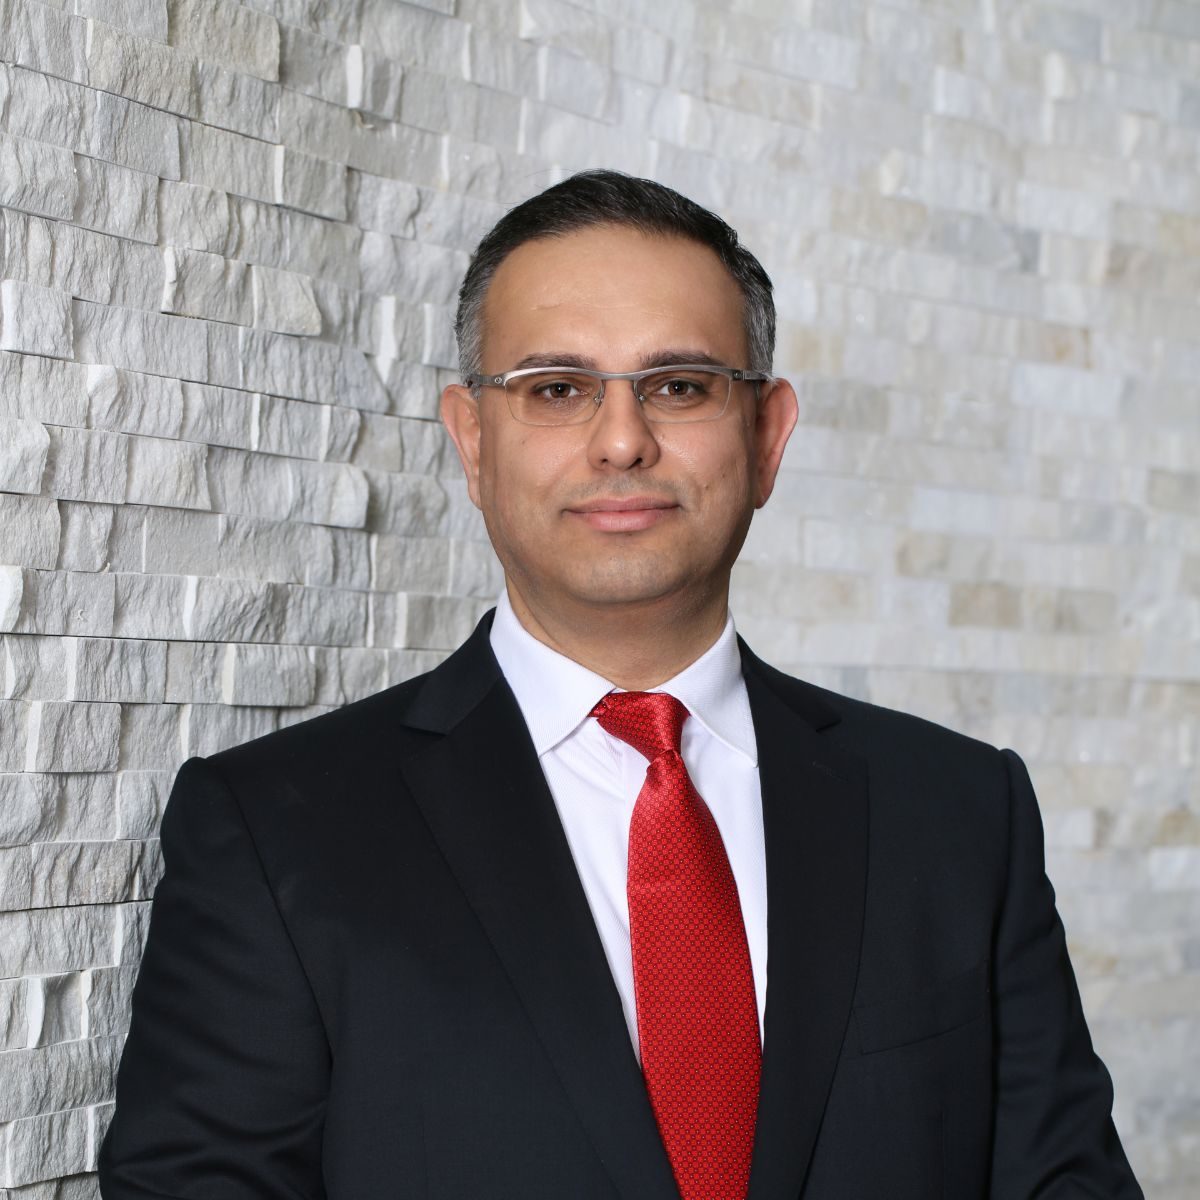 Shukri Makhlouf